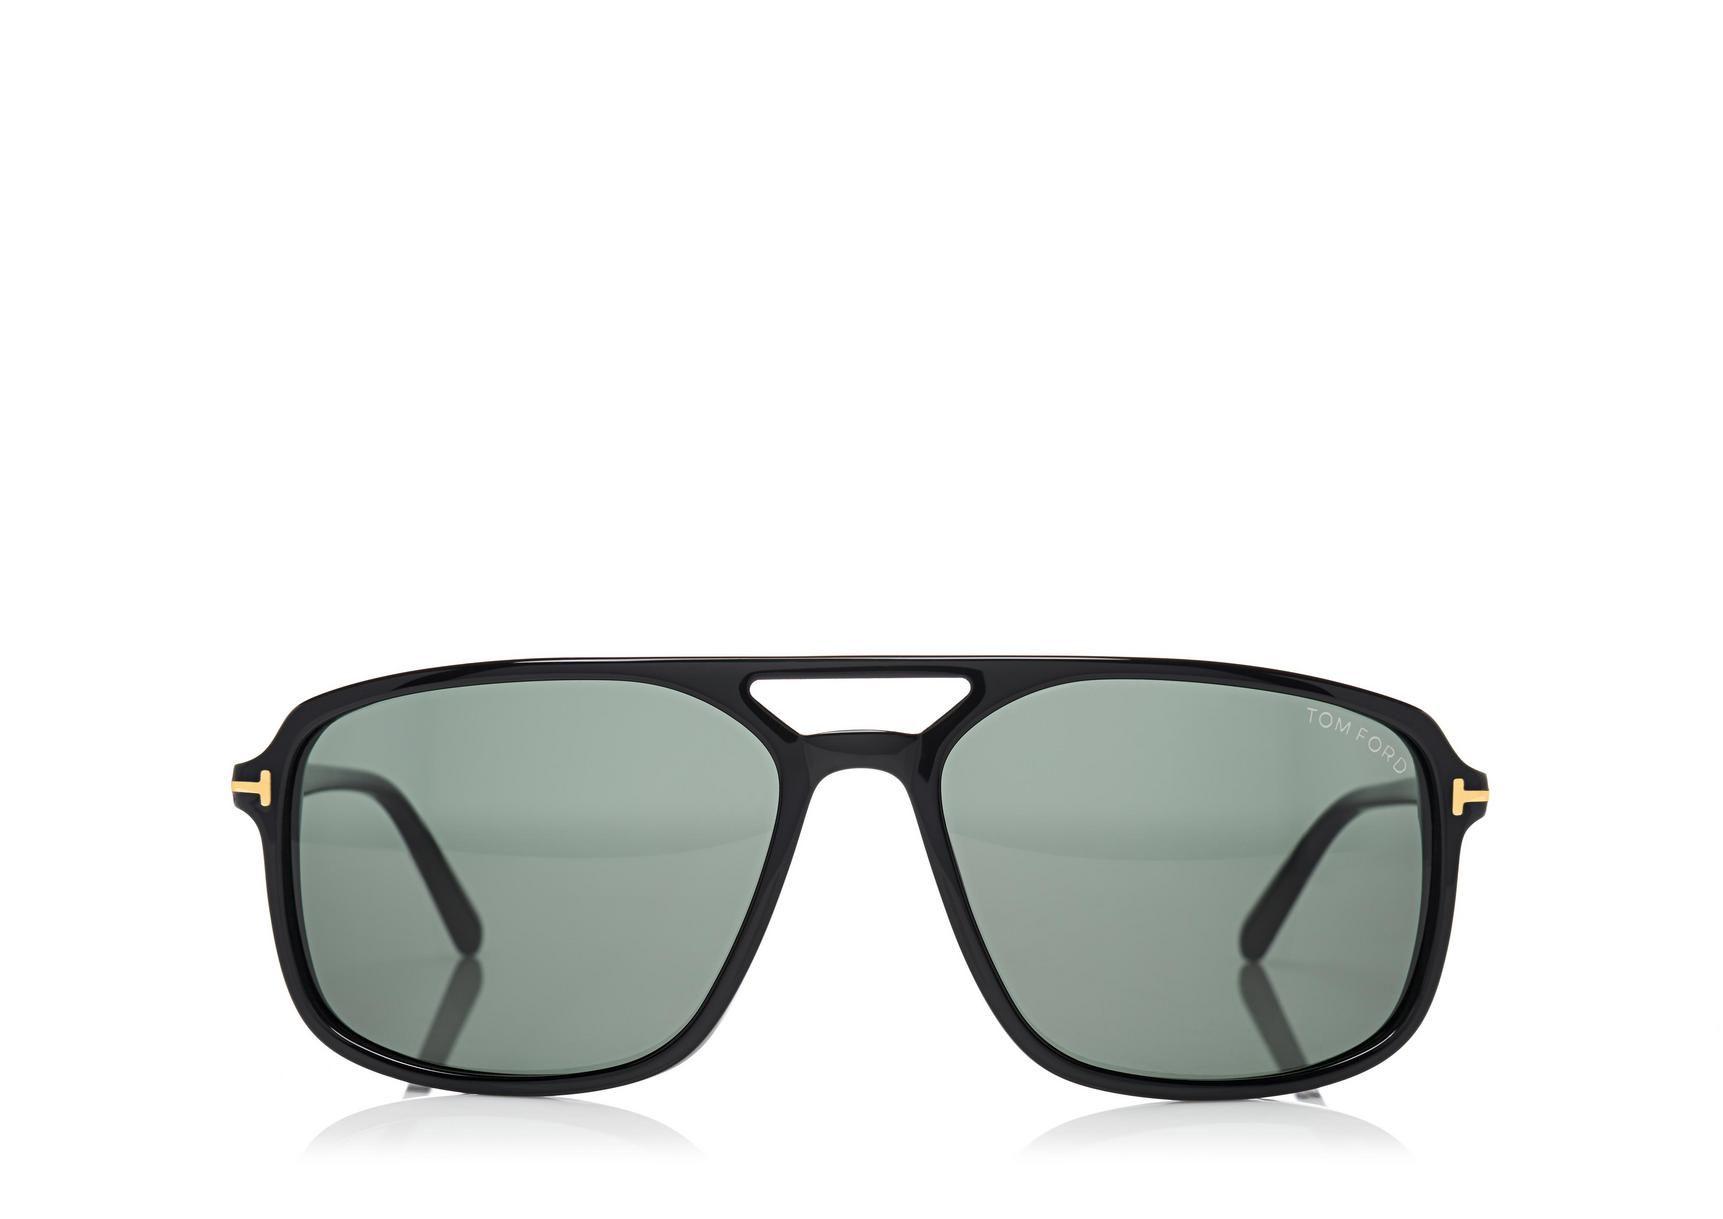 4840ba6282242 Terry Square Sunglasses   Tom Ford Eyewear   Sunglasses, Eyewear ...